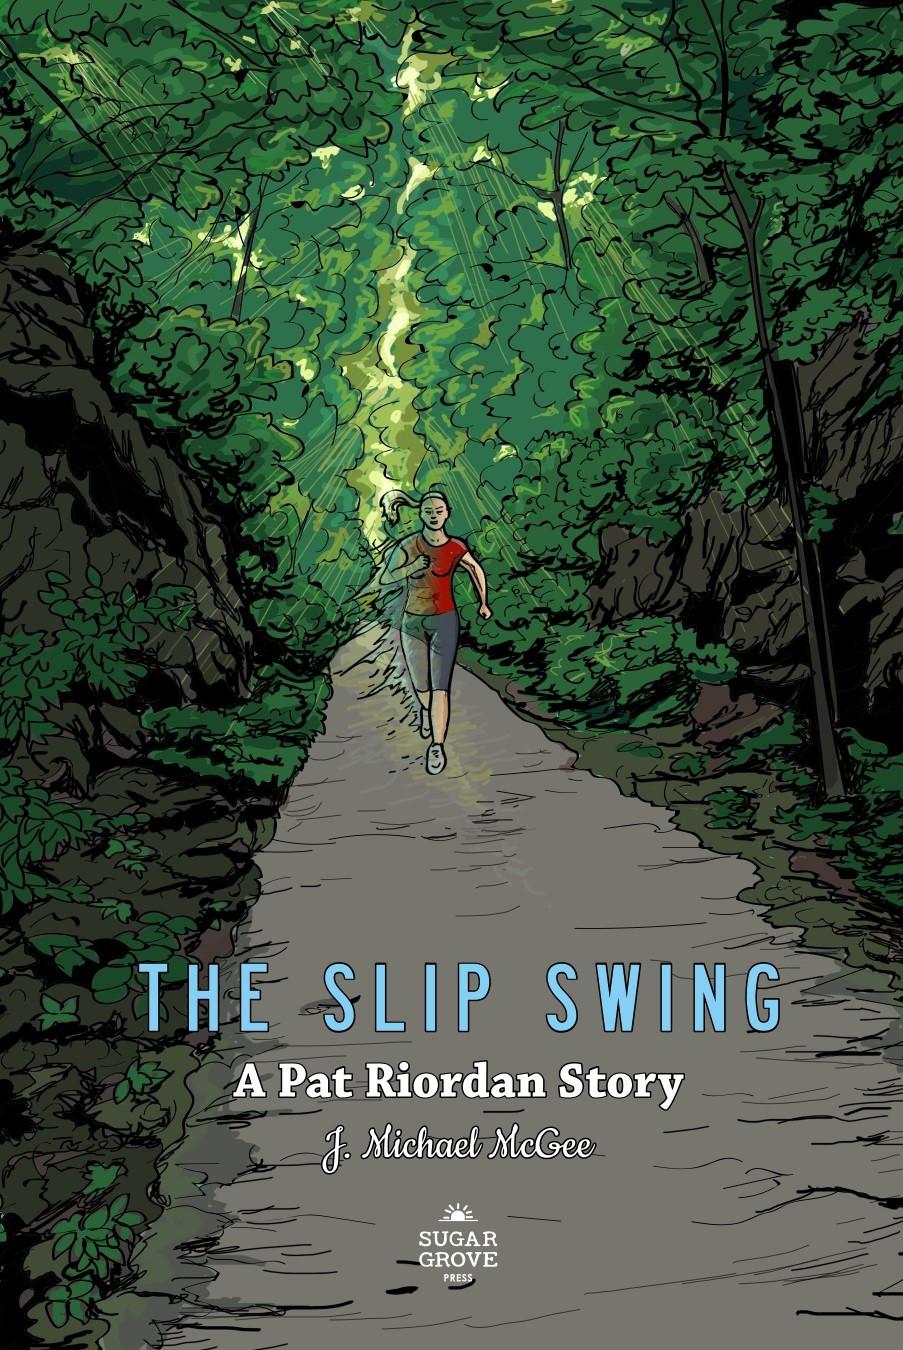 The Slip Swing Book 2 of the Pat Riordan Stories